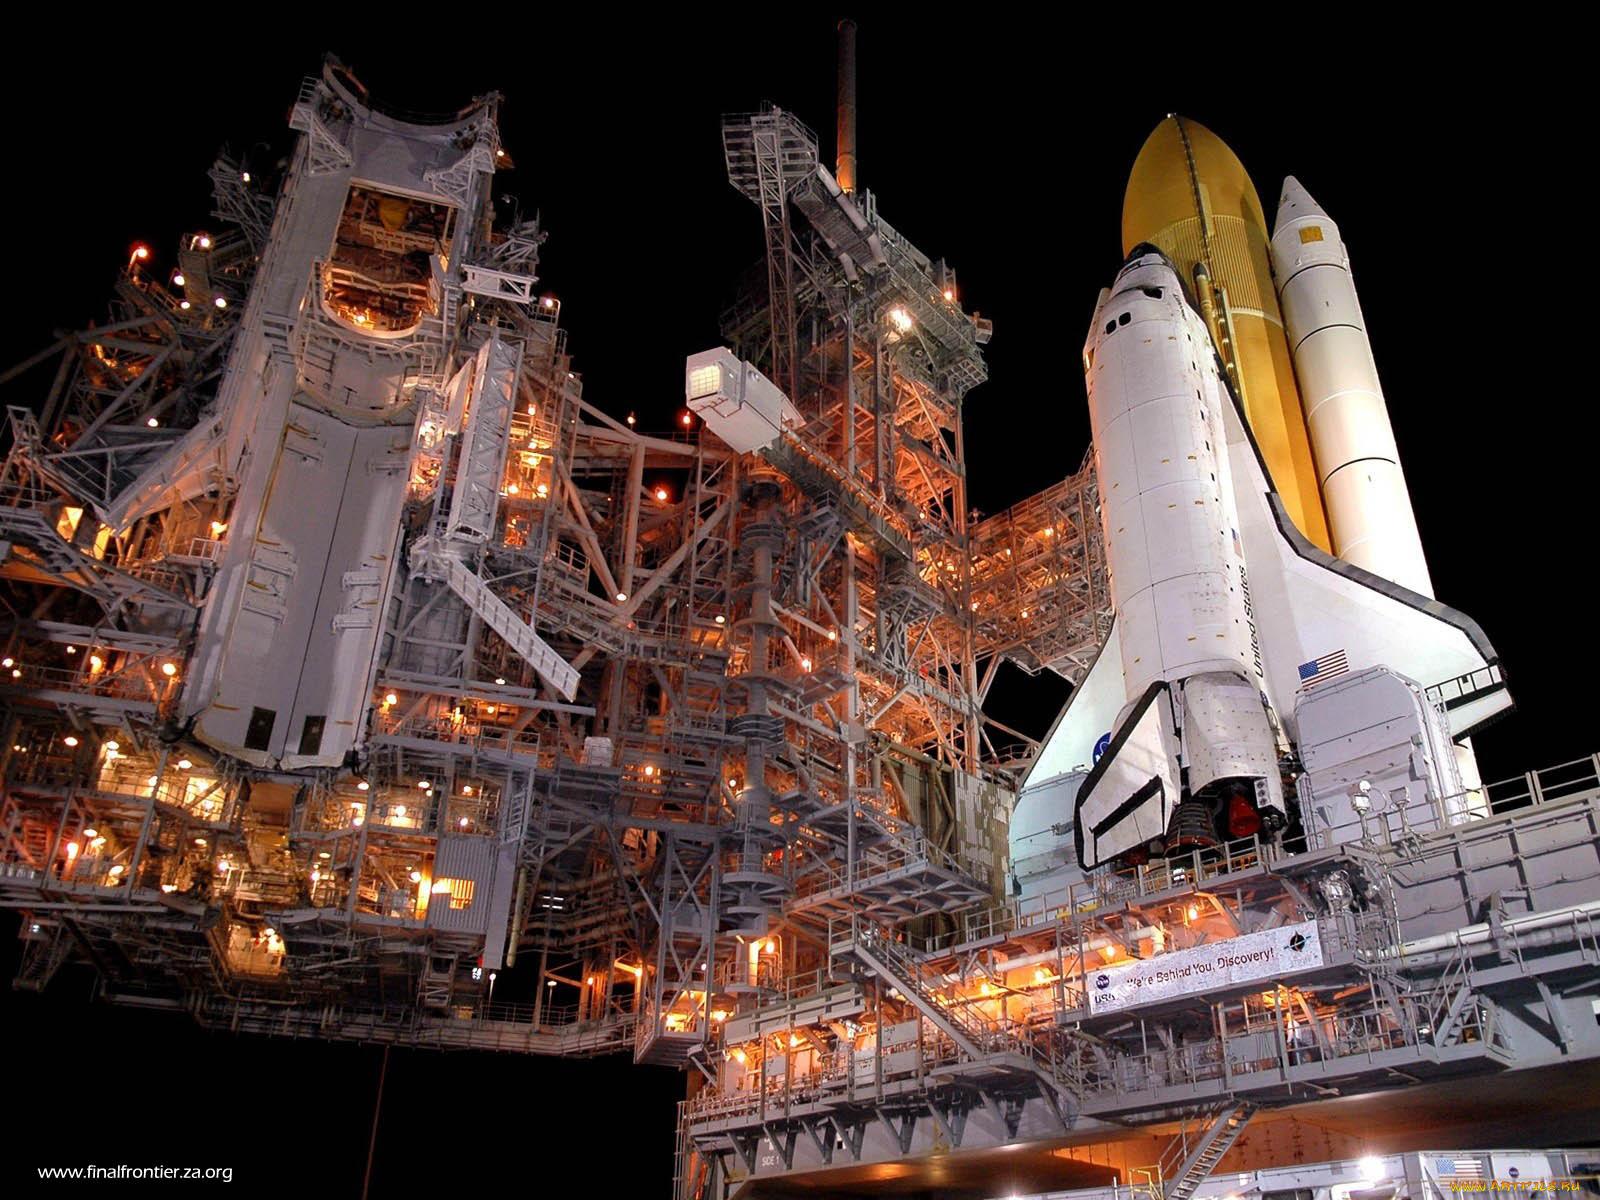 nasa new space shuttle design - 960×854